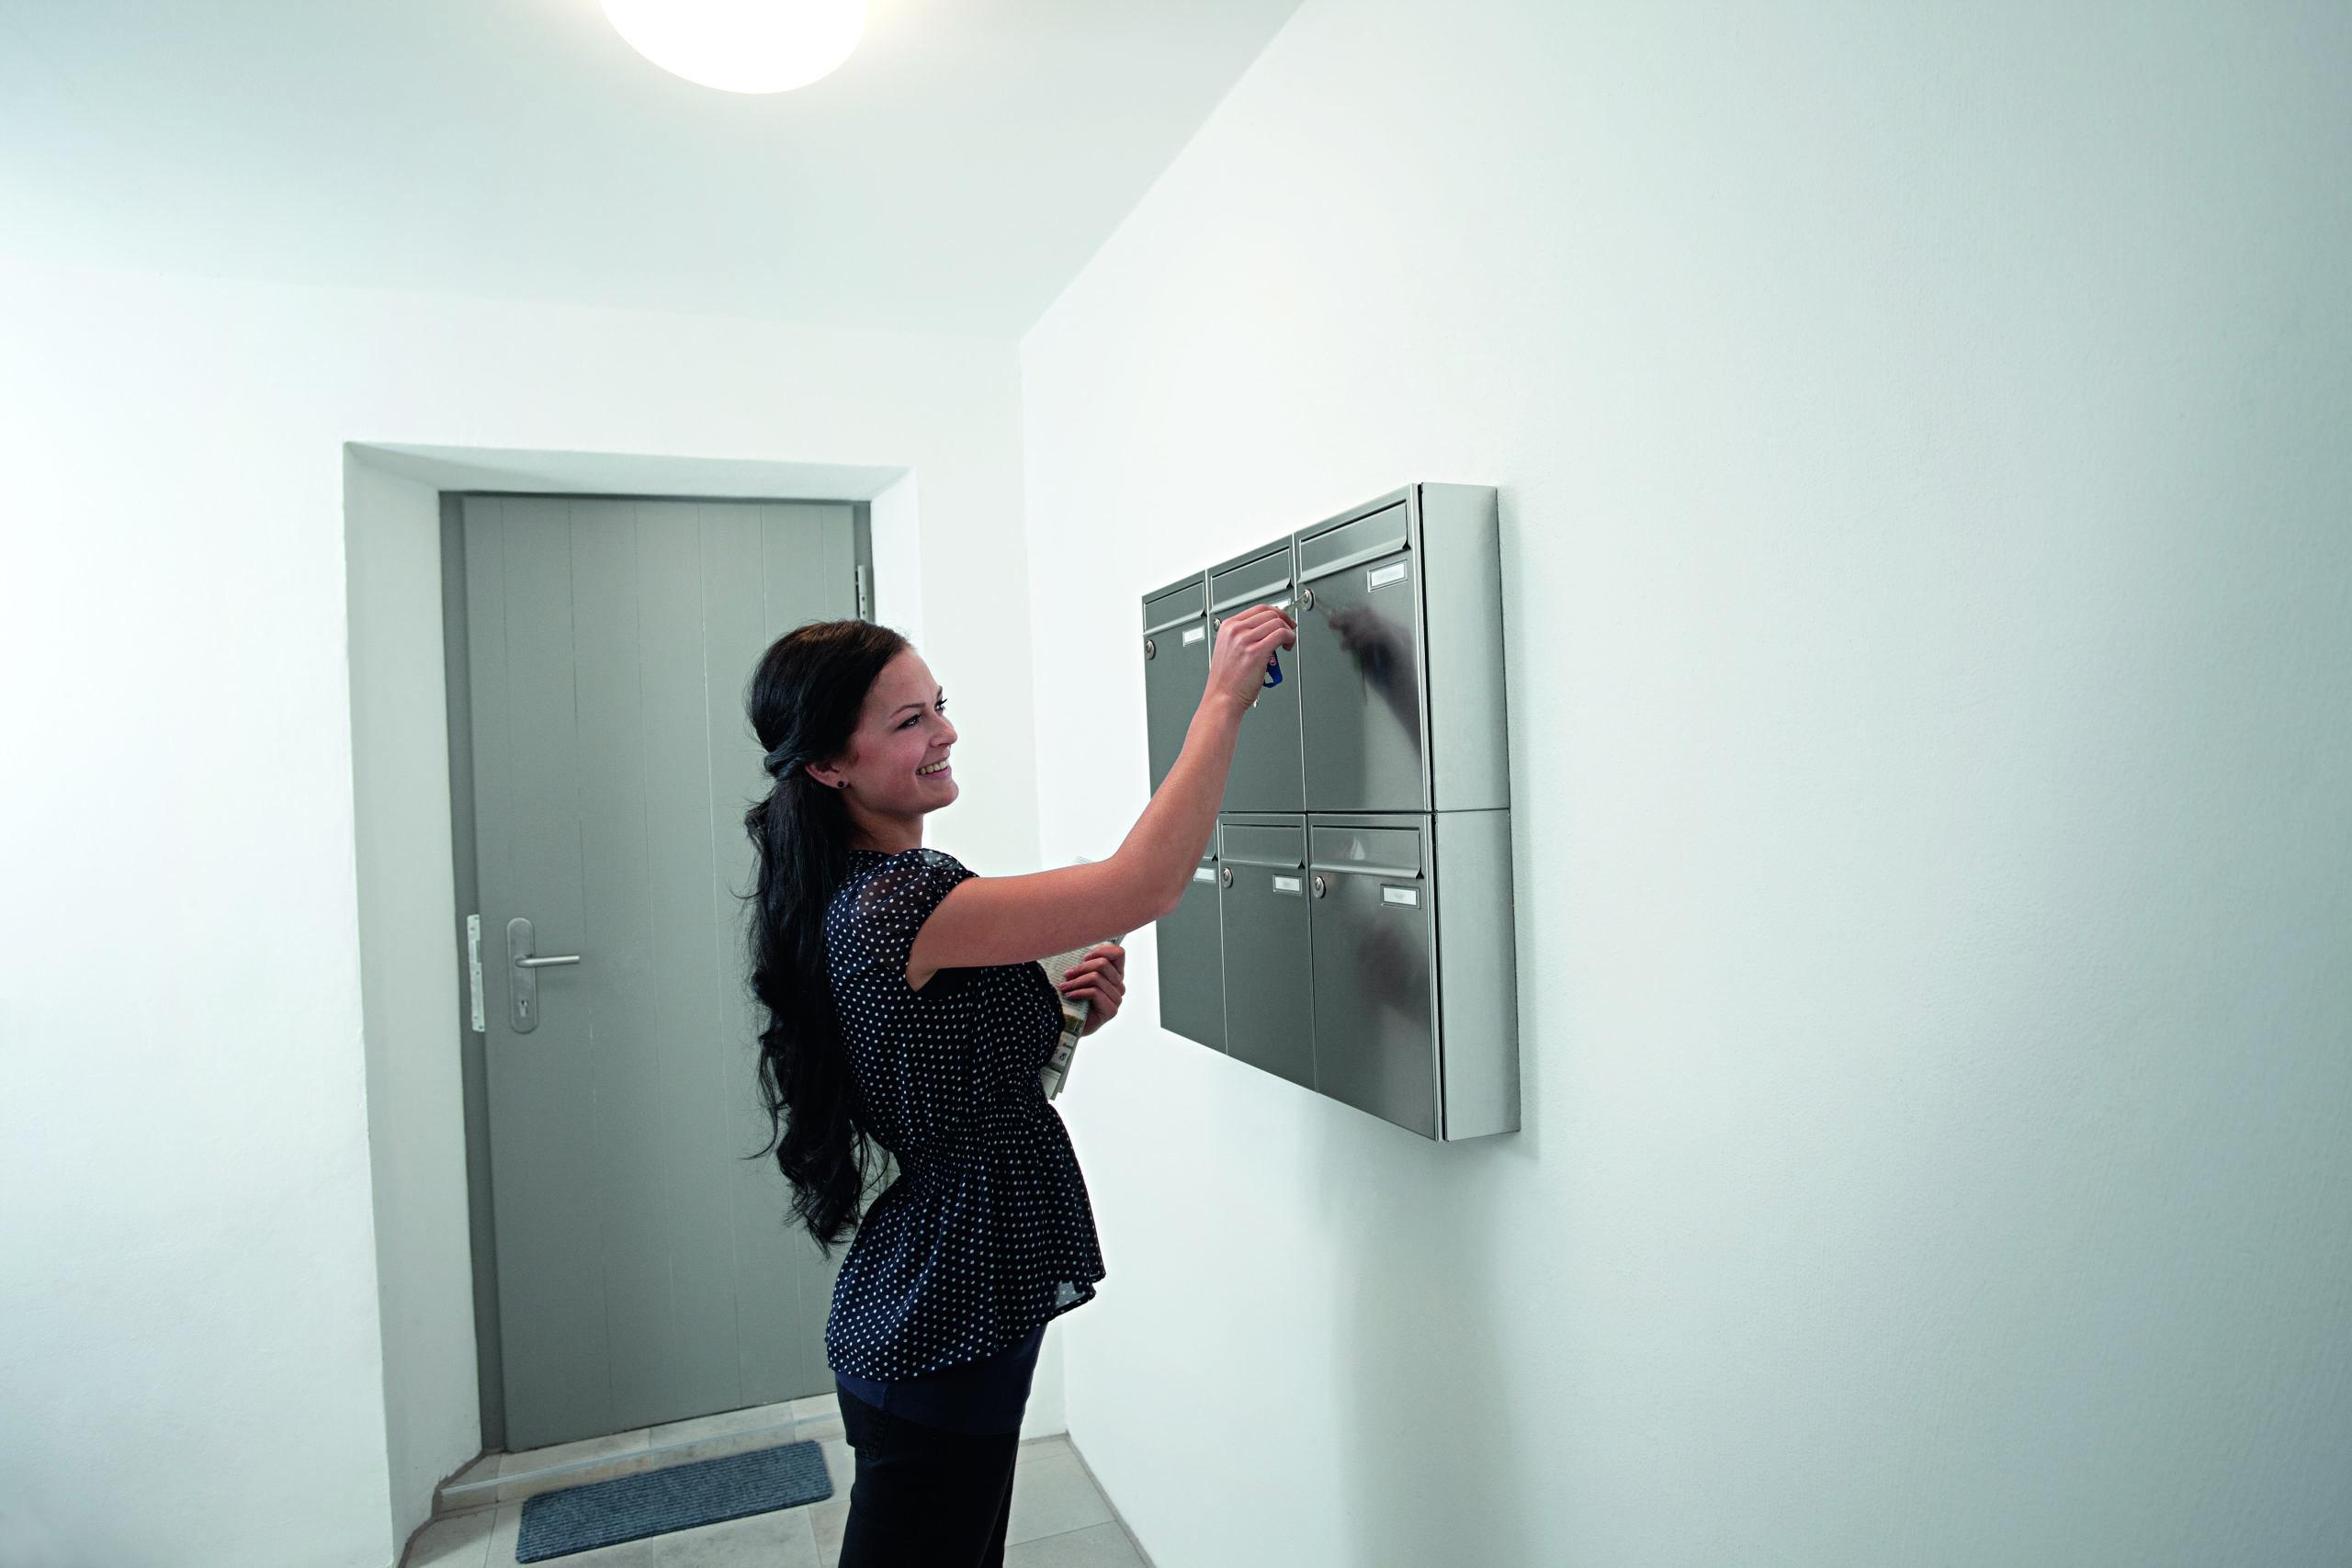 Vitess låsesystem henvender sig primært til erhverv og boligforeninger. Låseserien besidder også den patenteret Intop-låsesikring.